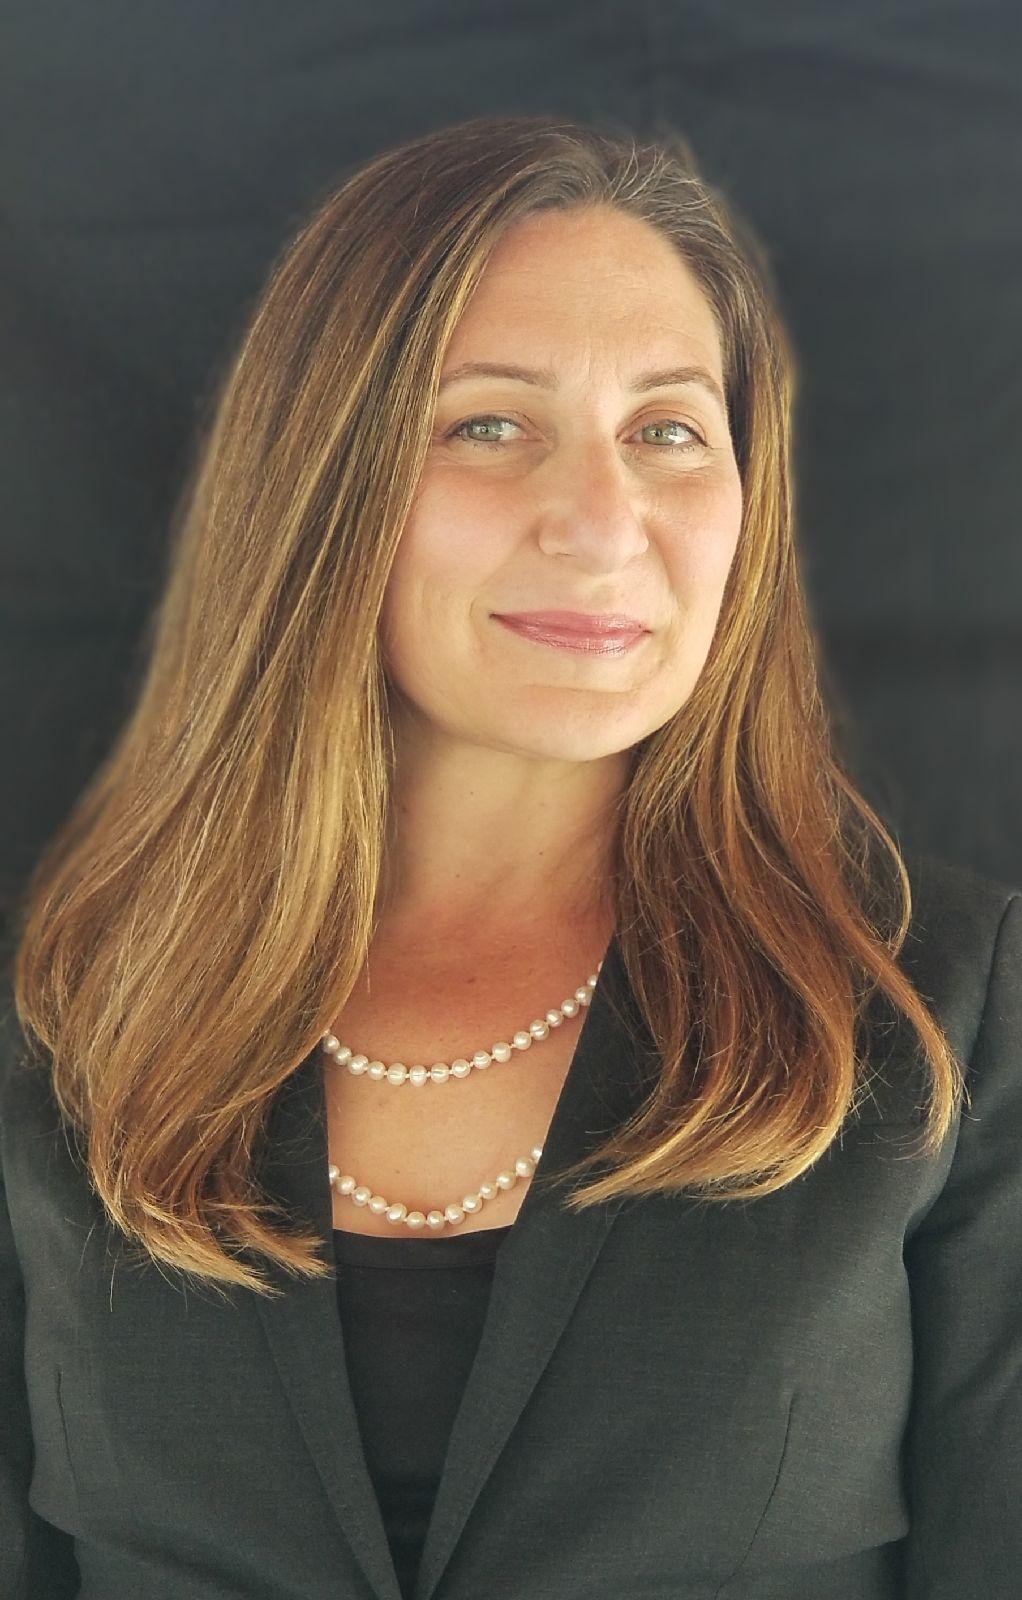 Assistant Principal Nina Zamora